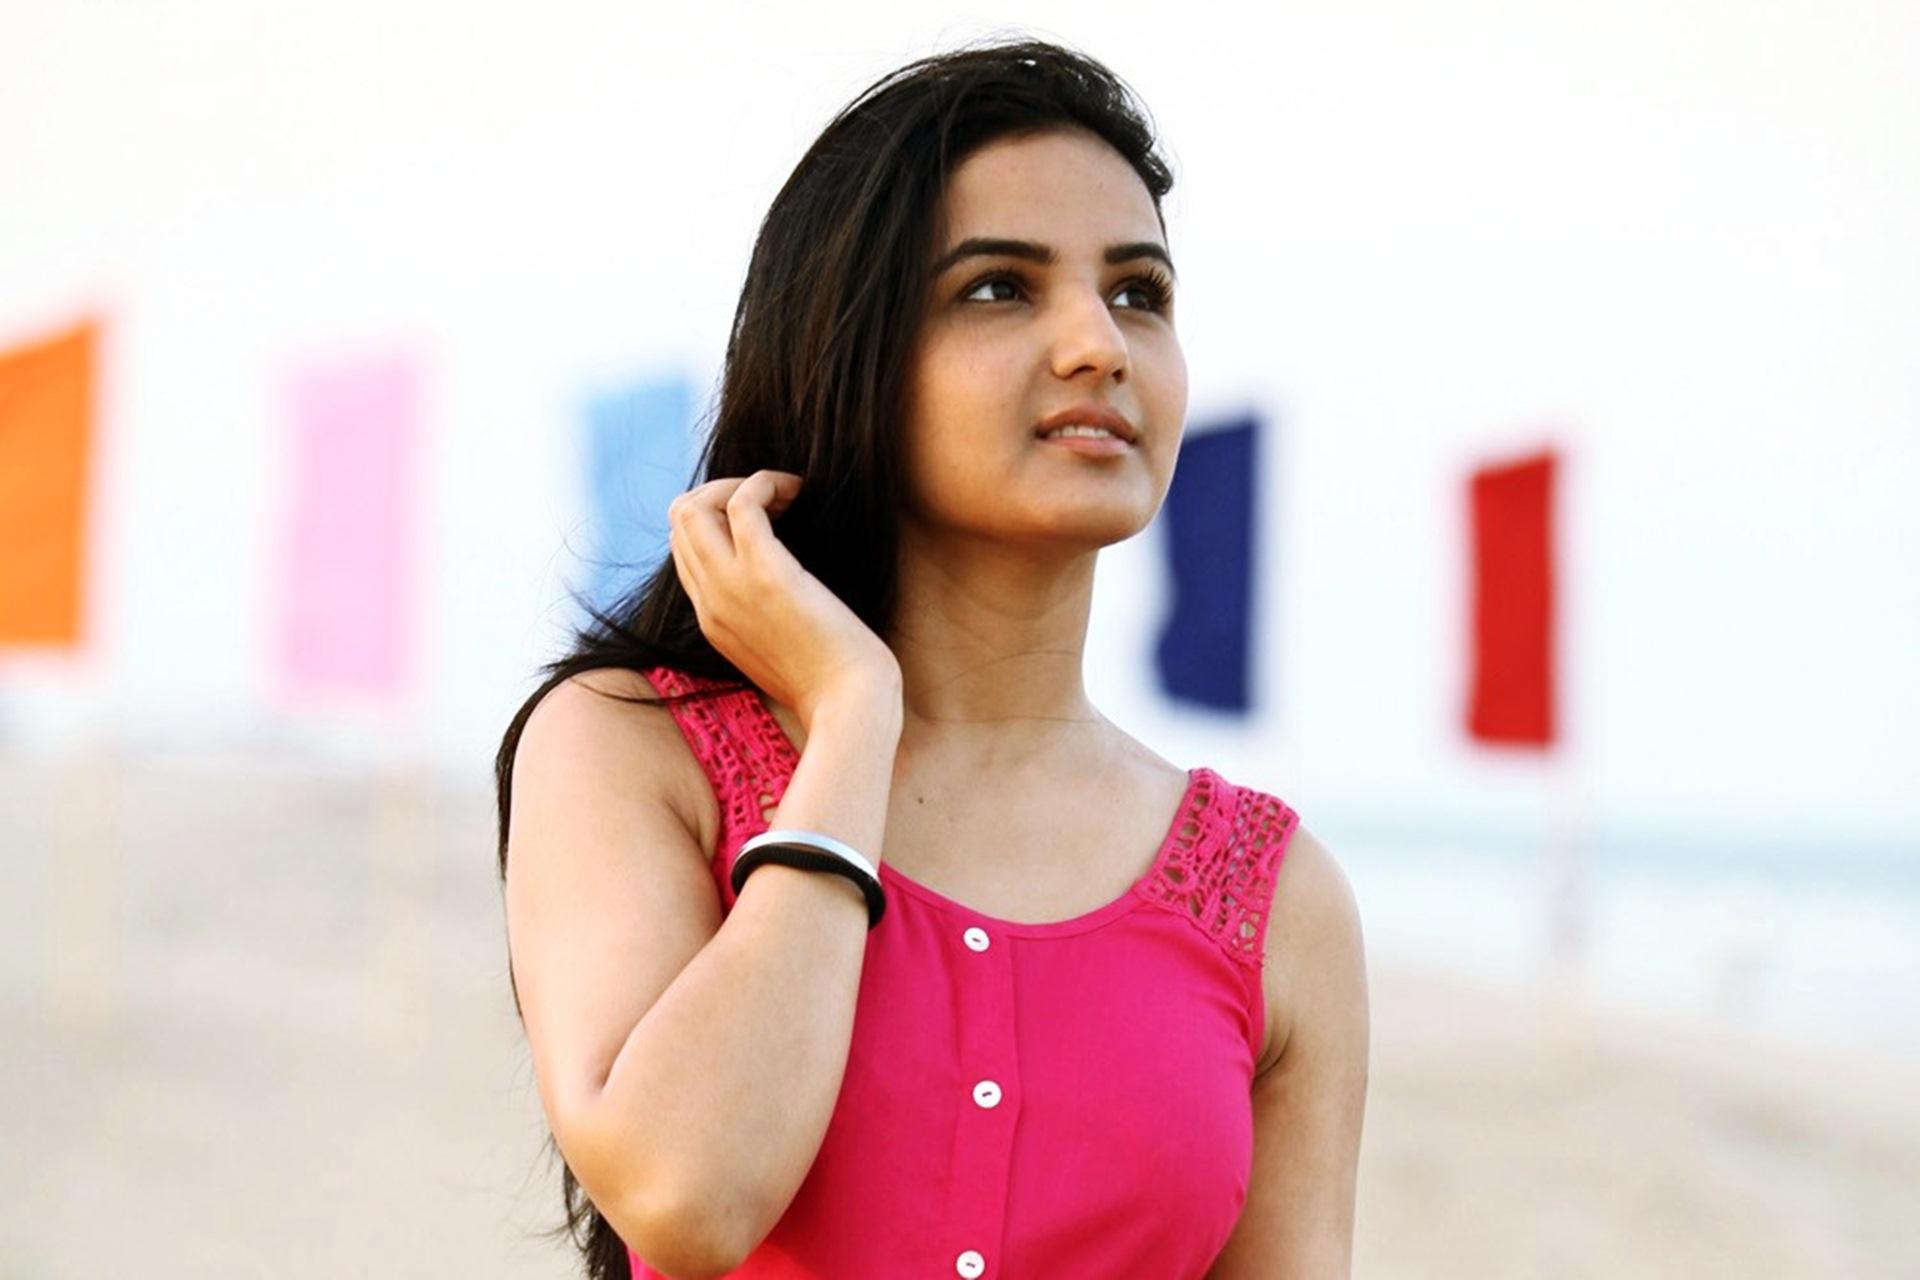 Jasmin Bhasin Wallpaper HD 21029